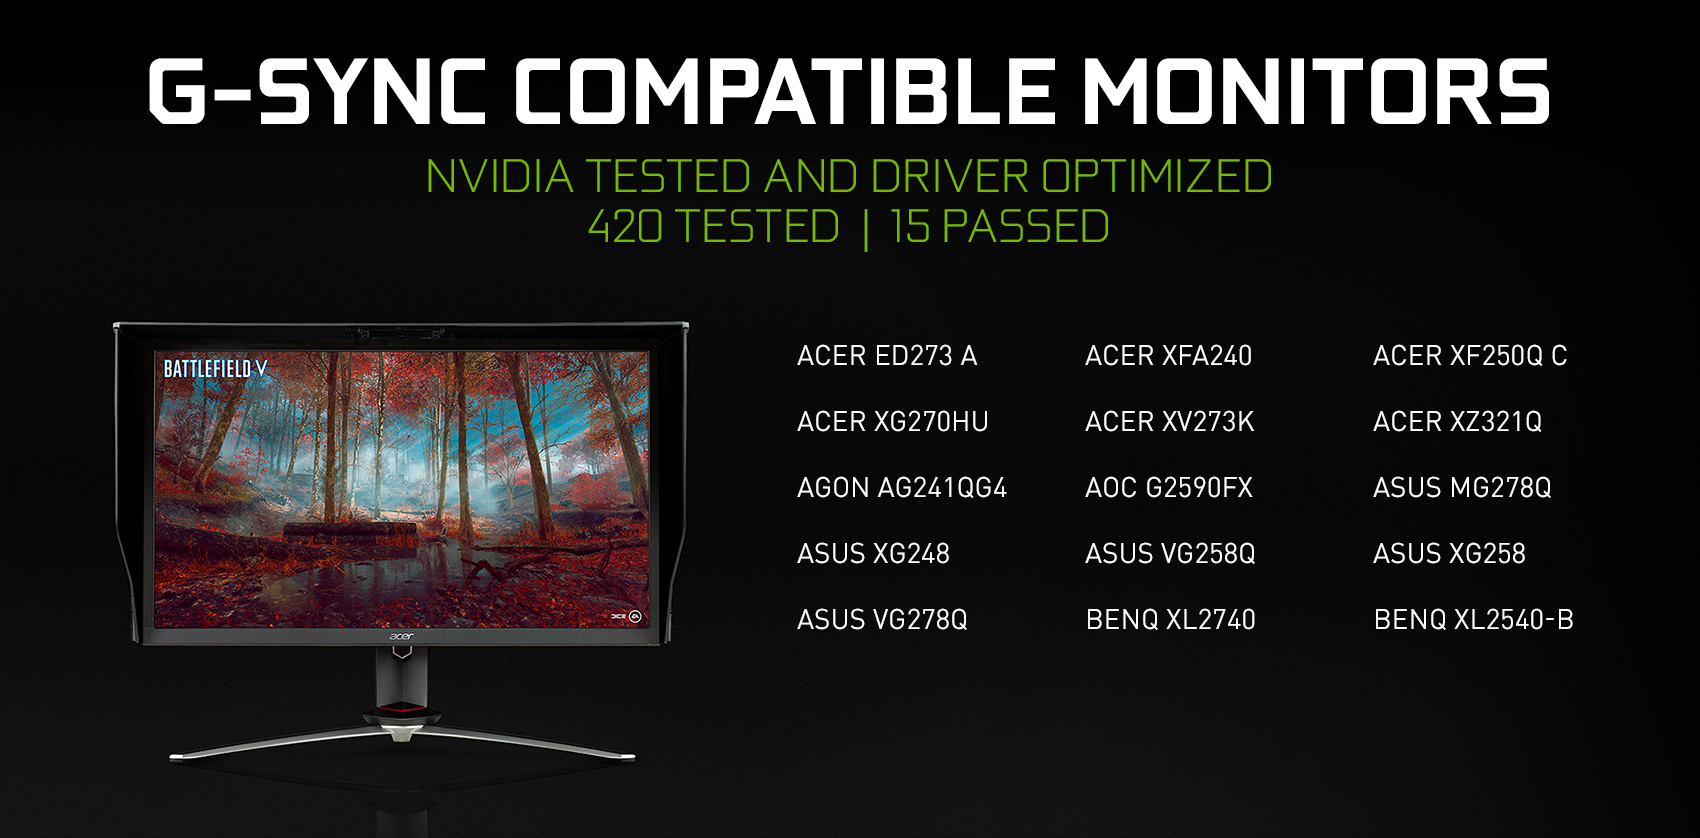 nvidia 1060 drivers wont install